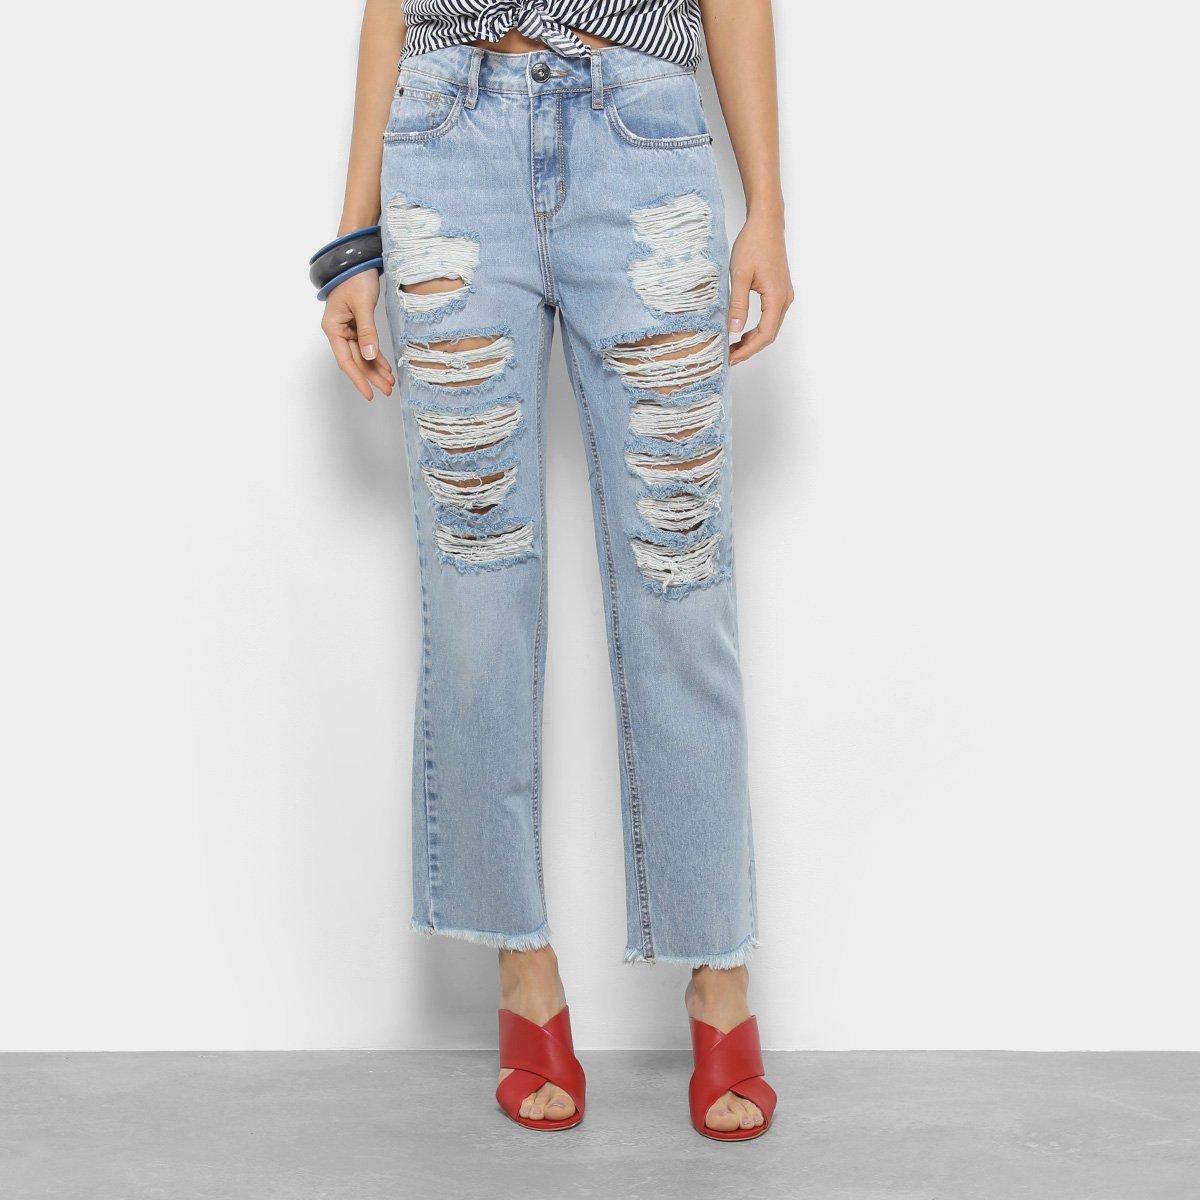 bc24d9add Calça Jeans Boyfriend Forum Lolita Cintura Média Feminina - Tam  36 ...